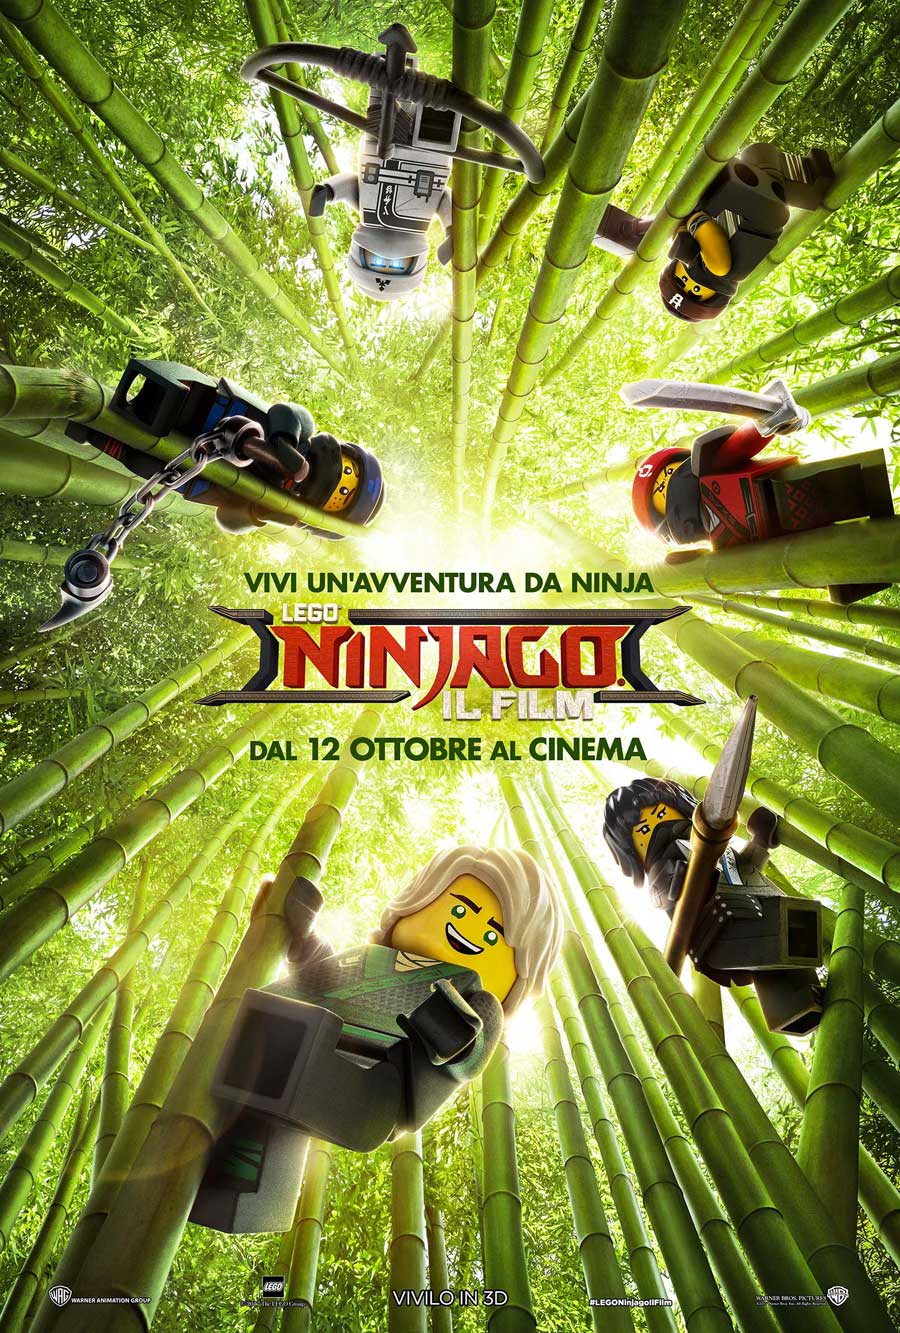 LEGO NINJAGO IL FILM - Poster italiano